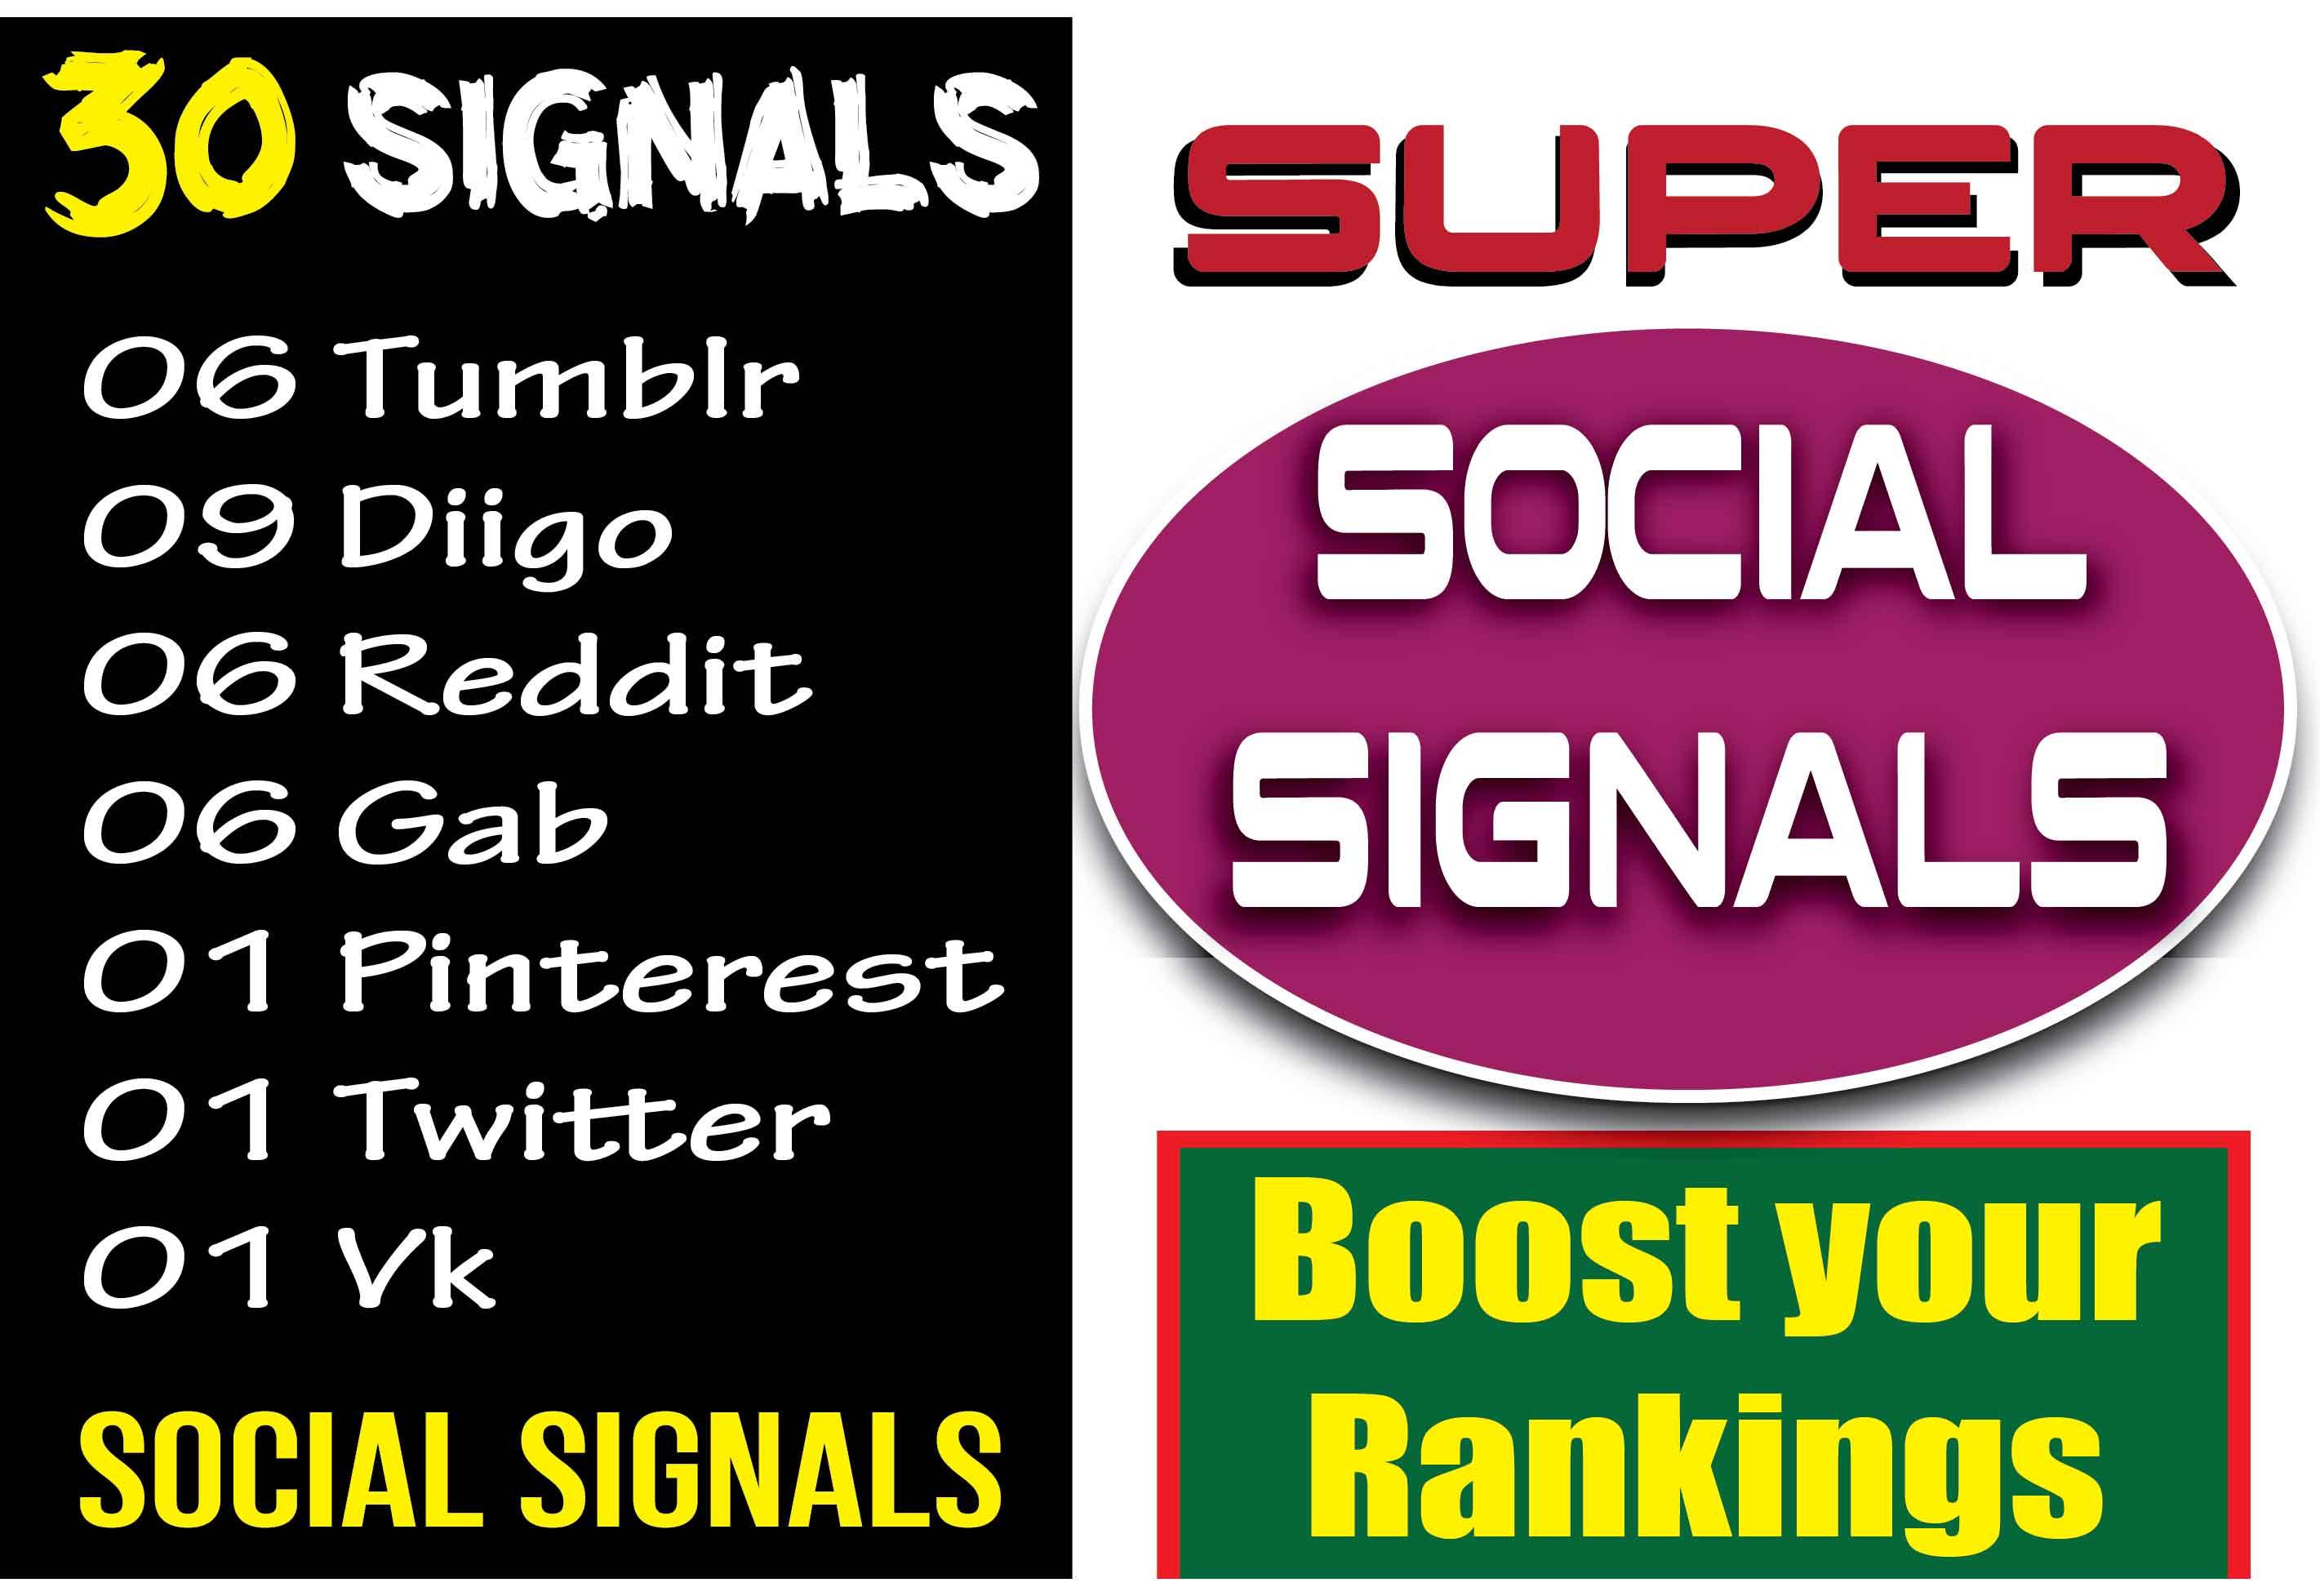 6 Tumblr,  9 Diigo,  6 Reddit,  6 gab,  1 Pinterest,  1 Twitter,  1 Vk Signals to increase website traffic